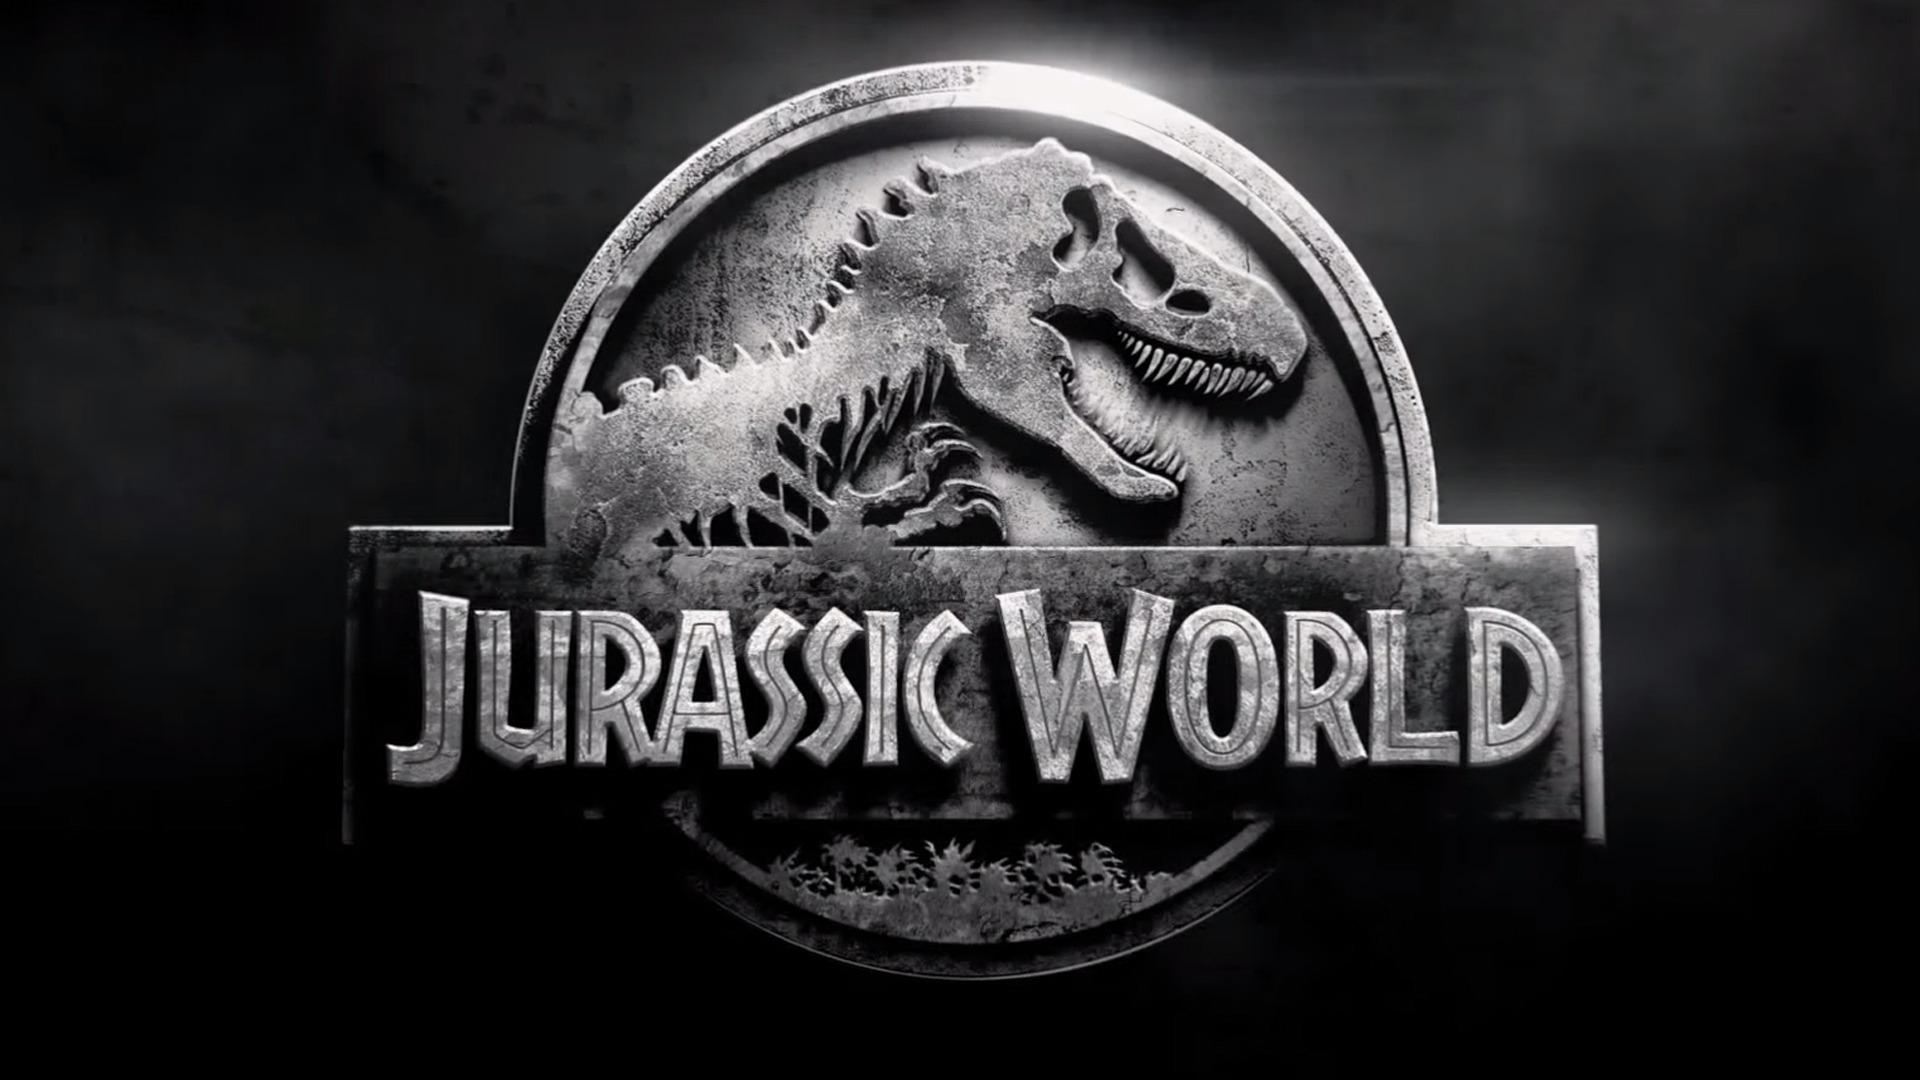 Happy Diwali Hd Wallpaper With Quotes Jurassic World 2015 Movie Hd Wallpapers Volganga